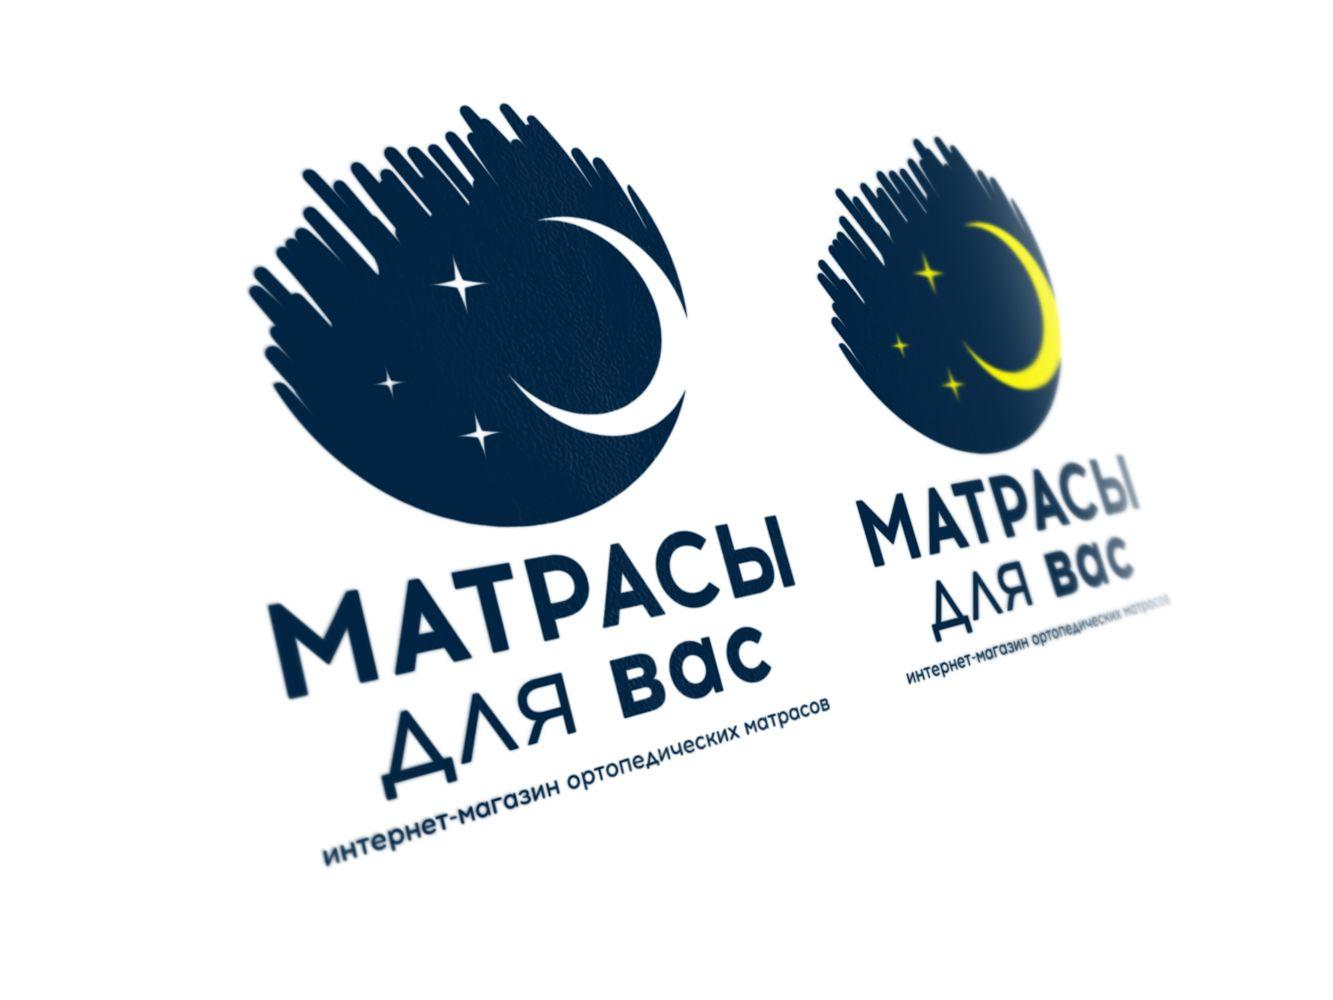 matras4u - дизайнер Nekto